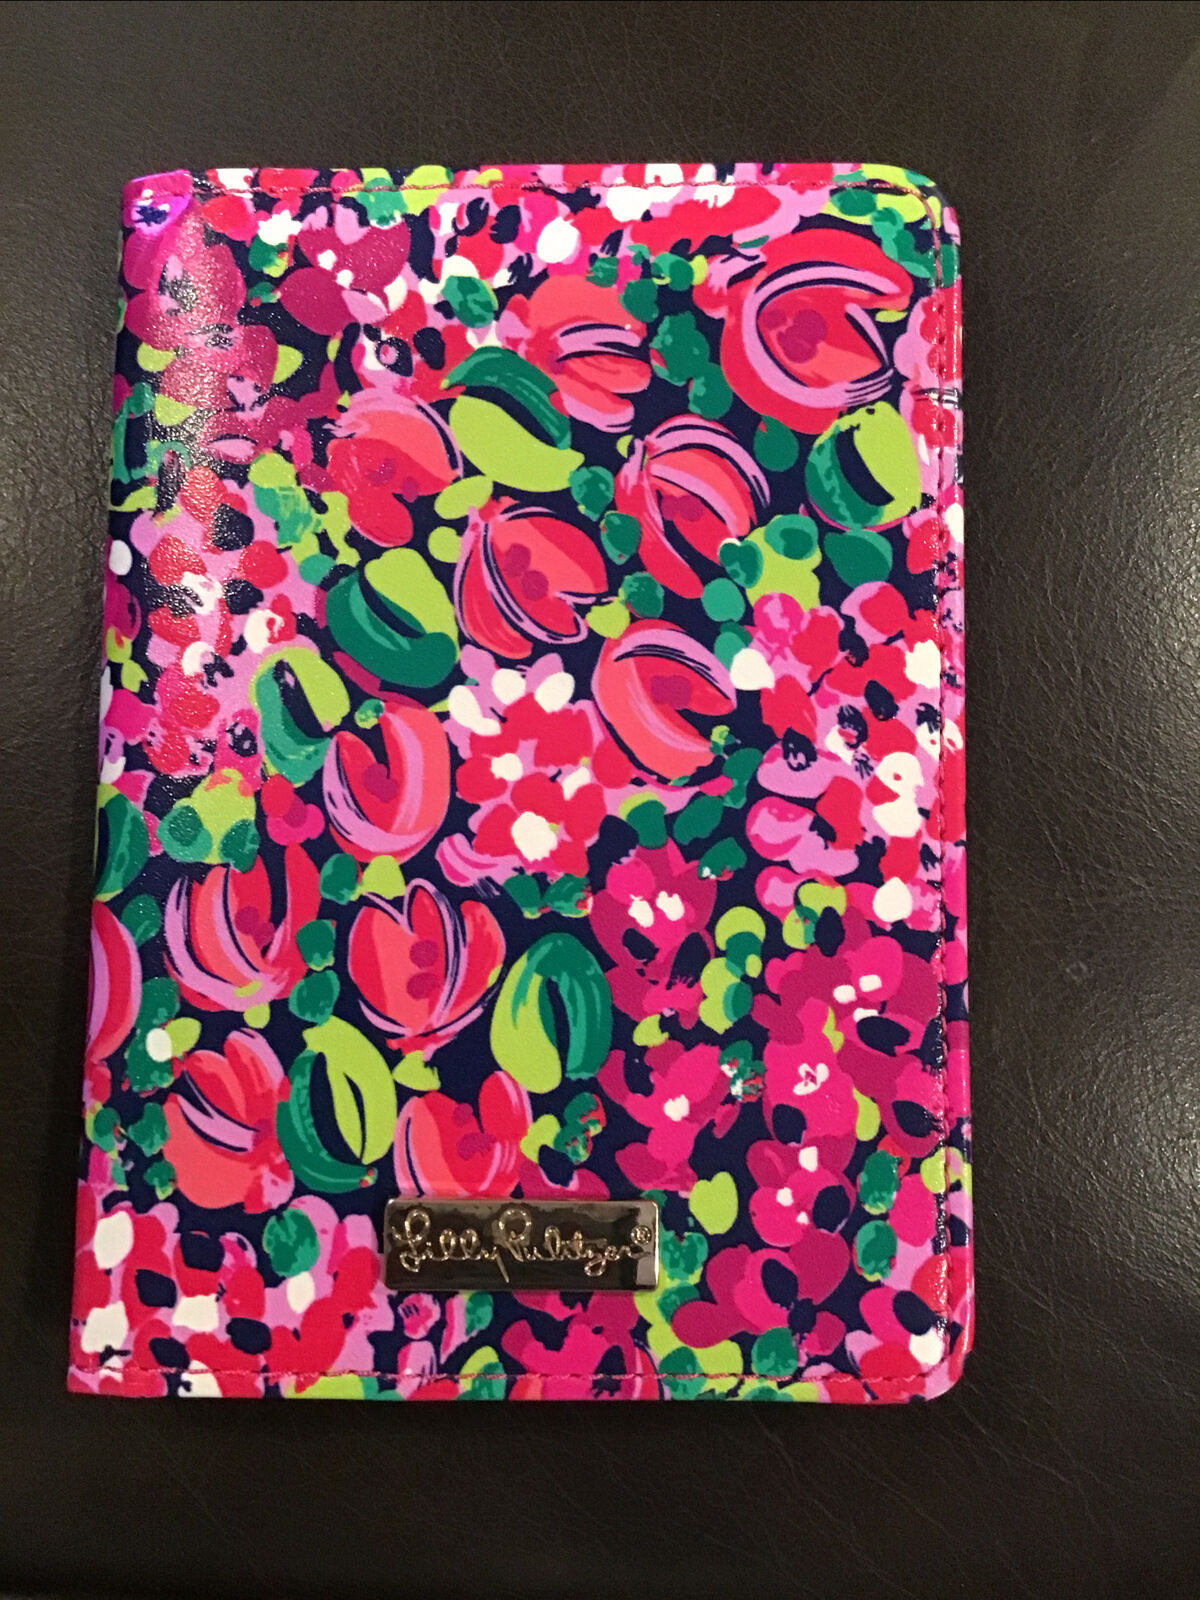 lilly pulitzer Floral bound credit card billfold Wallet 5 1/2 x 4